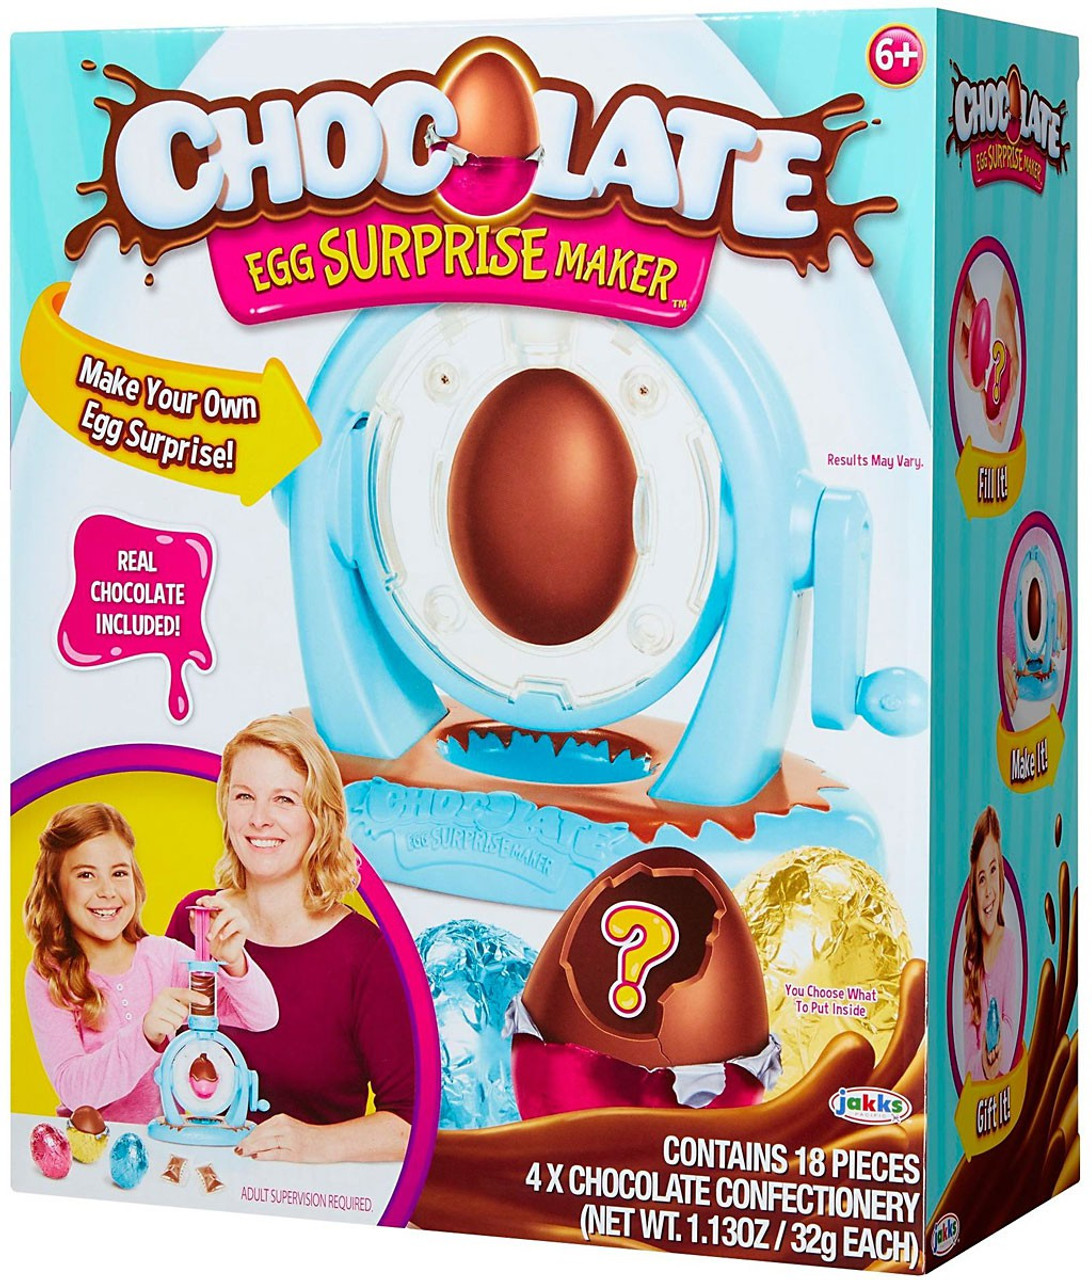 Chocolate Egg Surprise Chocolate Egg Surprise Maker Activity Play ...